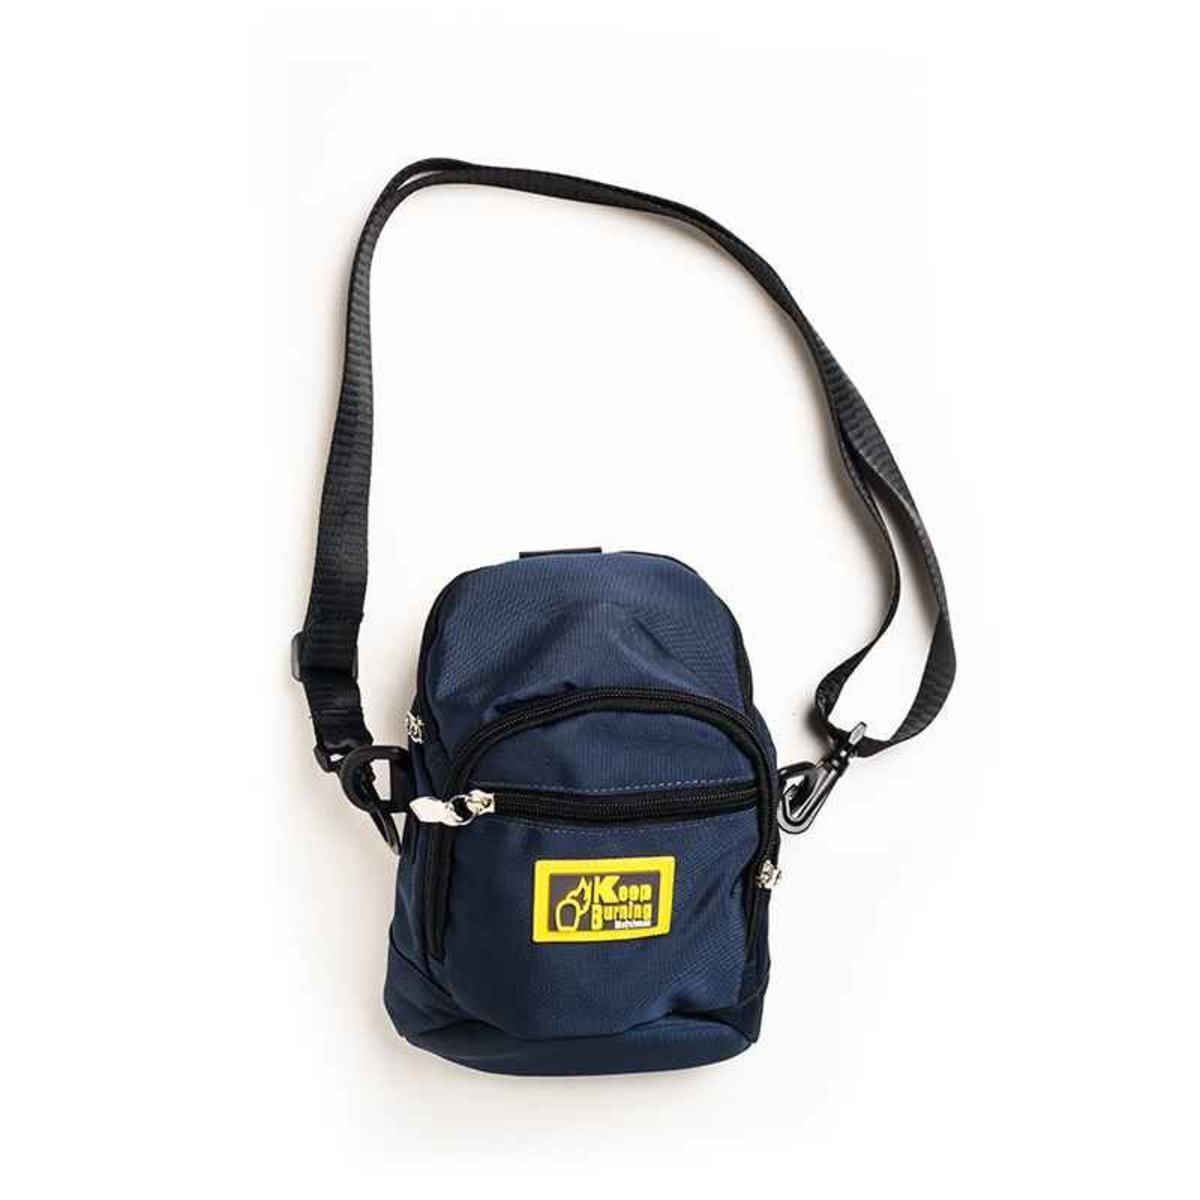 火柴人 Pouch Bag (藍)